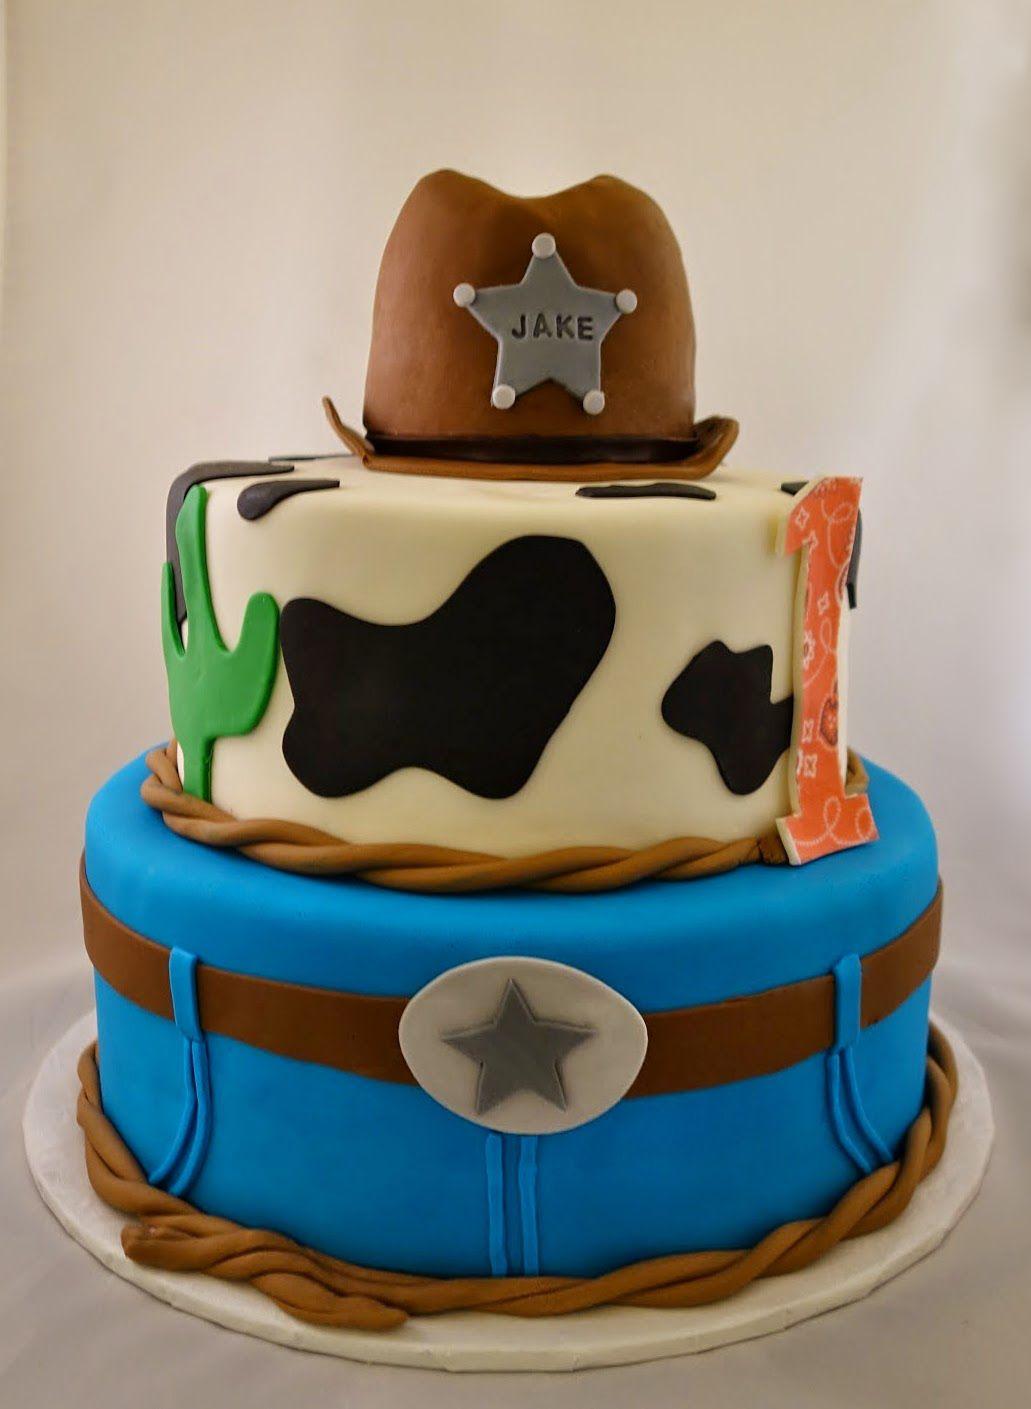 Wedding Cakes   Order cakes online, Cake, Order cake